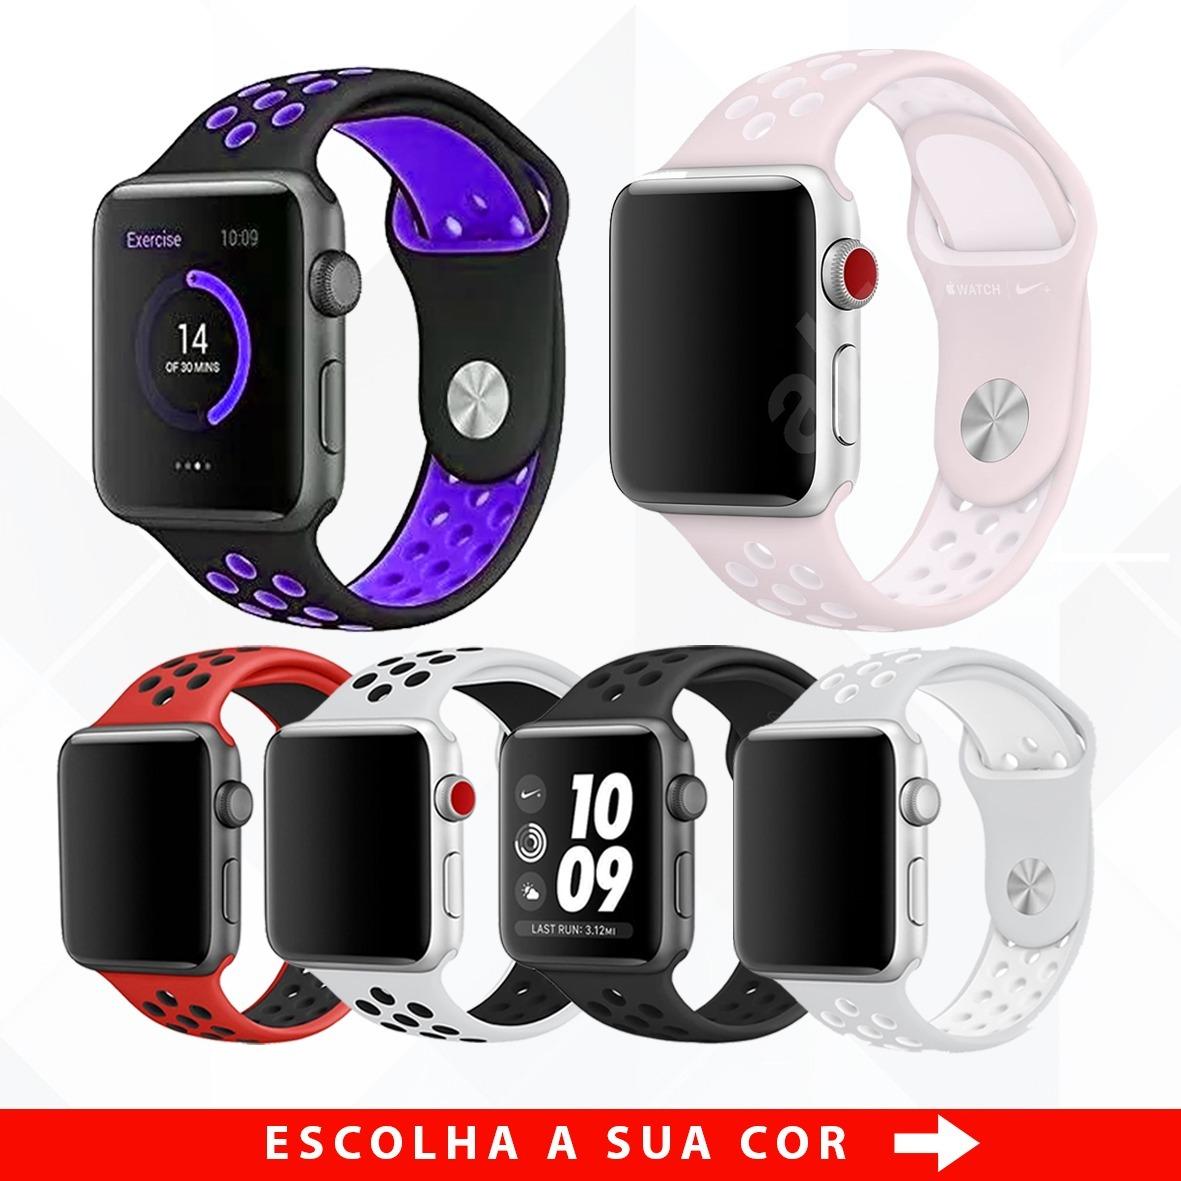 8f1bfda4399 pulseira apple watch esporte borracha 38mm 42mm séries. Carregando zoom.